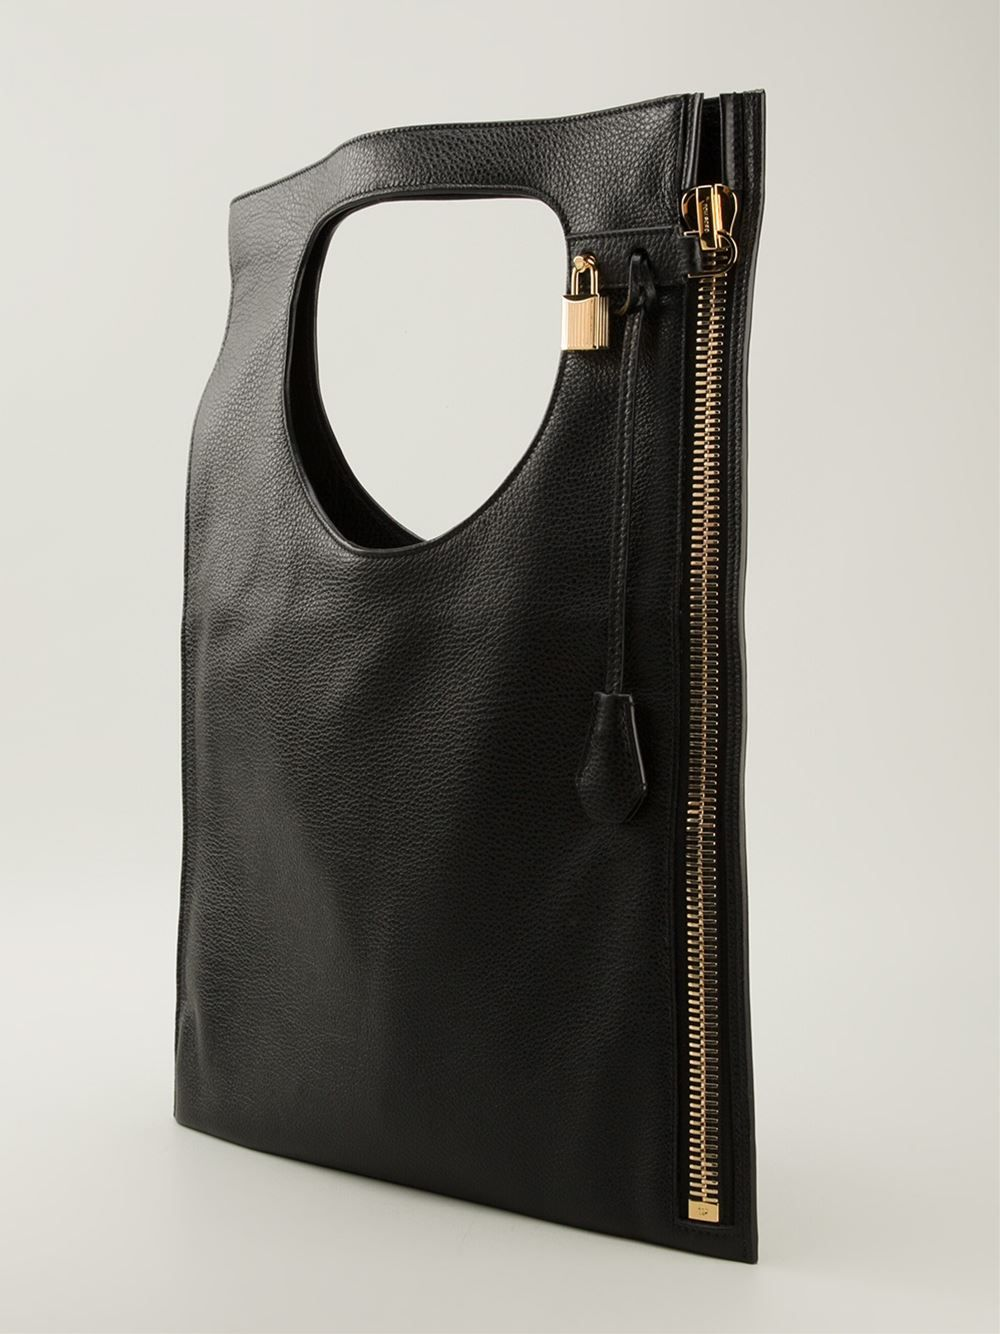 e3c5a2595a9b9 Women's Black 'Alix' Shoulder Bag | Style | Bags, Minimalist bag ...